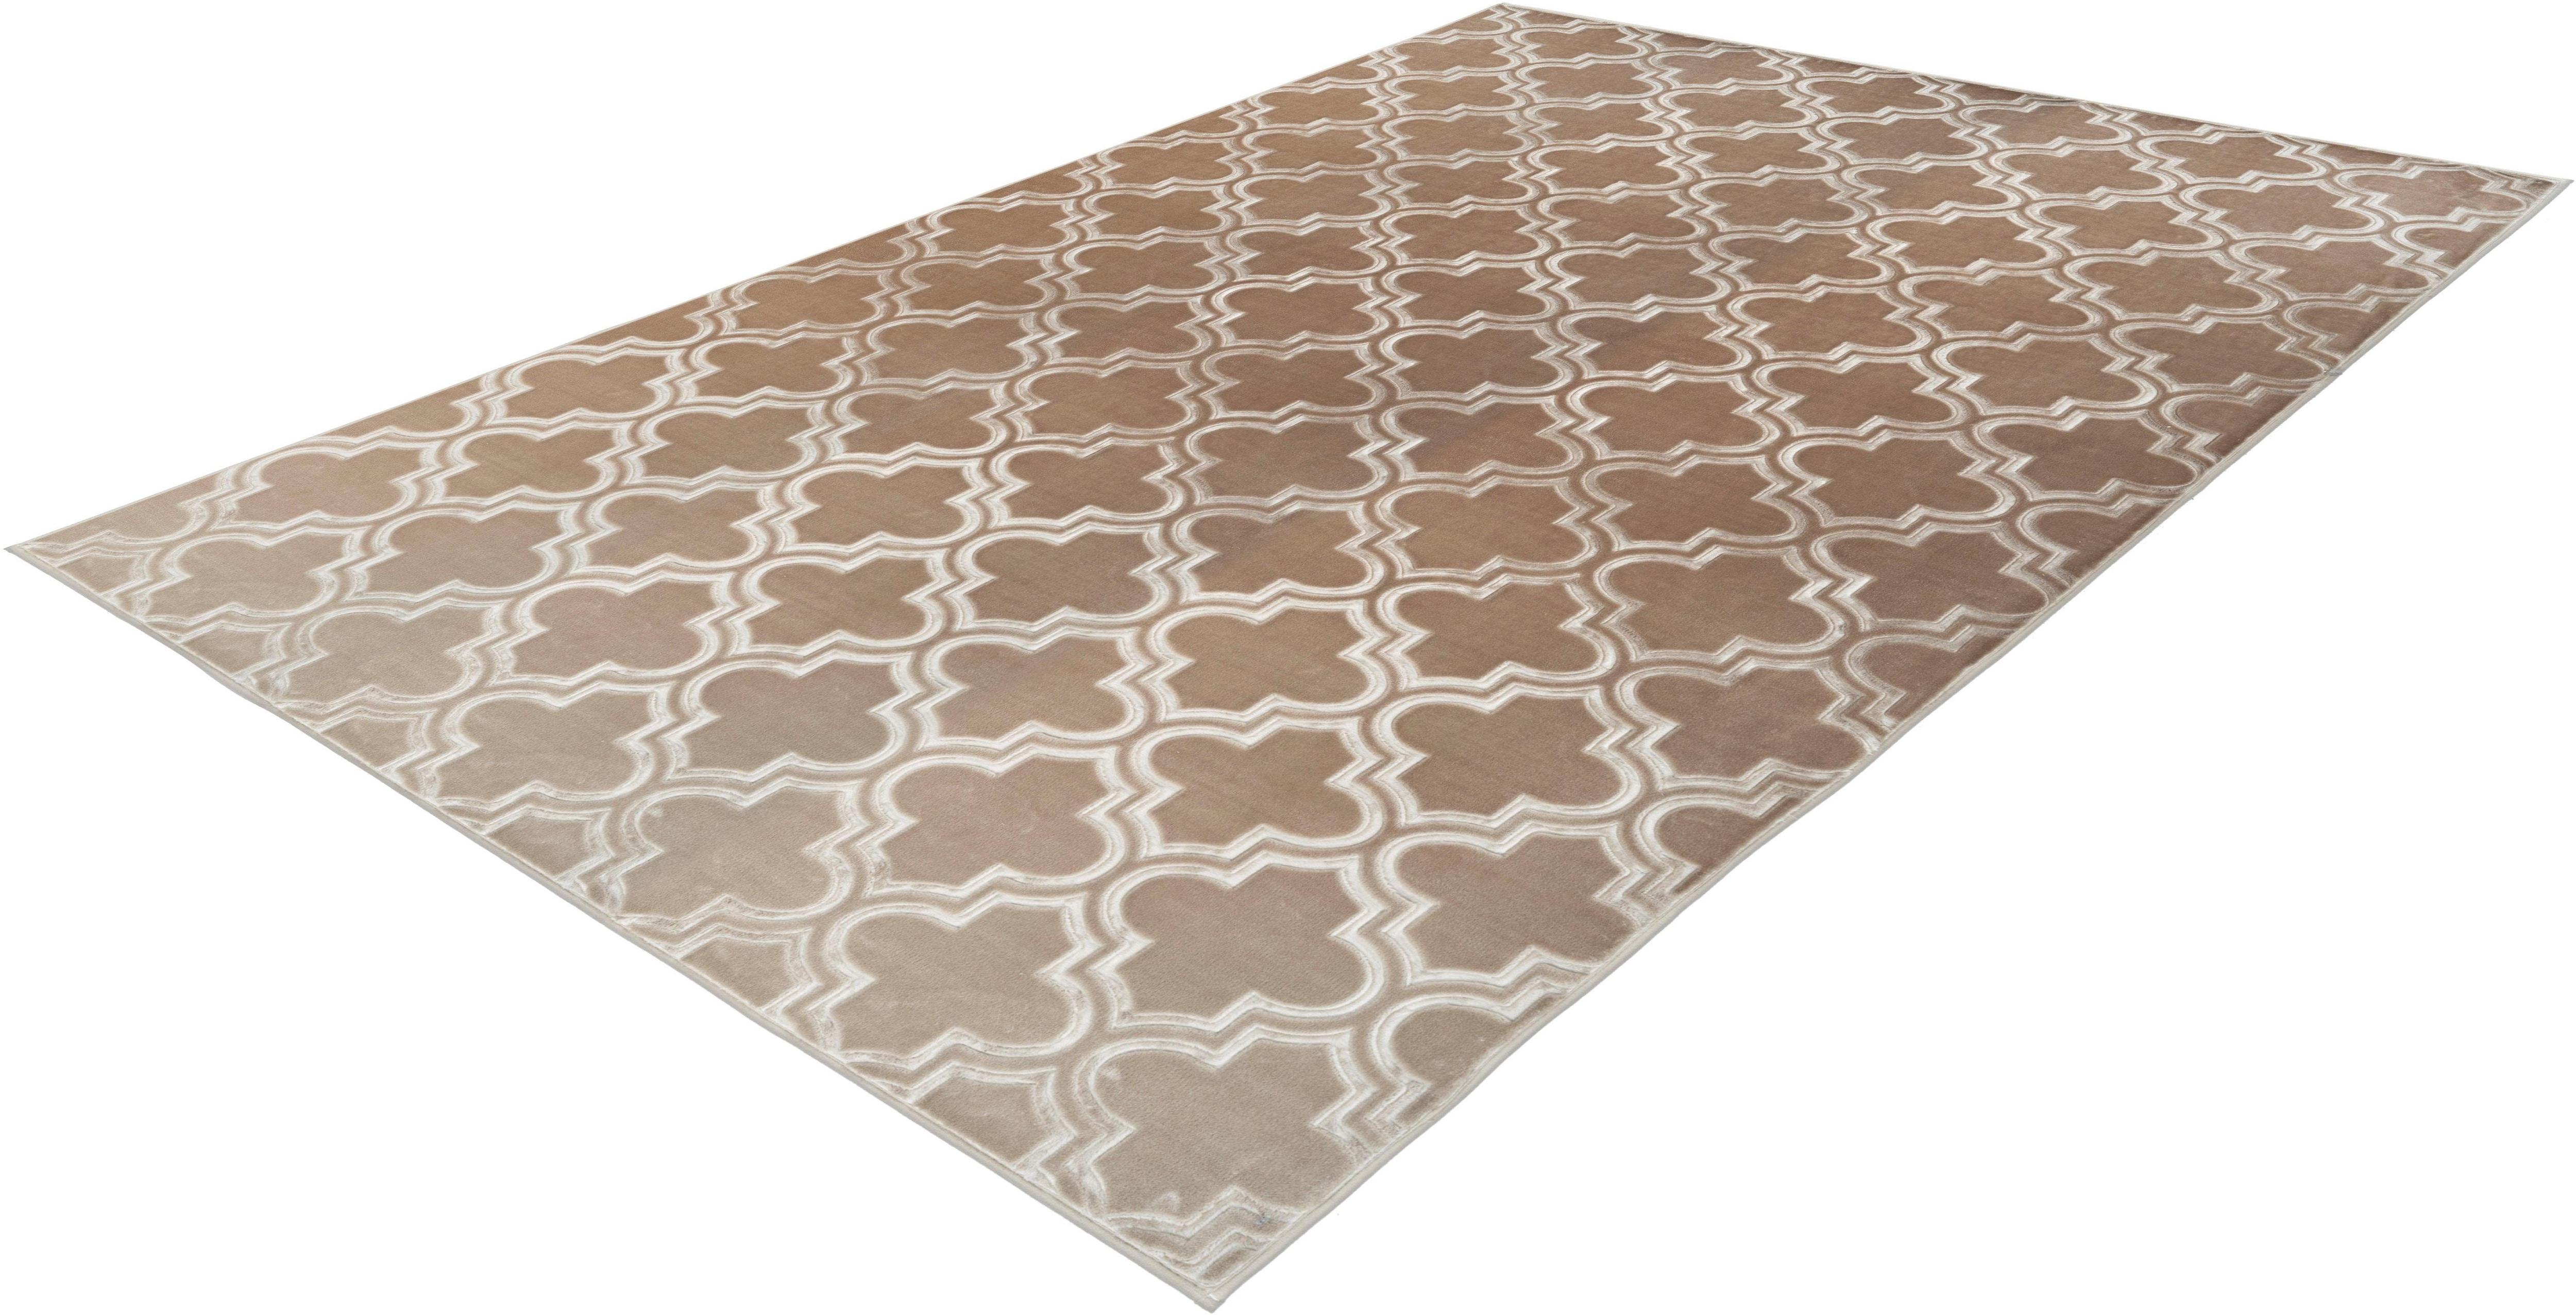 Teppich Latemar 200 calo-deluxe rechteckig Höhe 7 mm maschinell getuftet